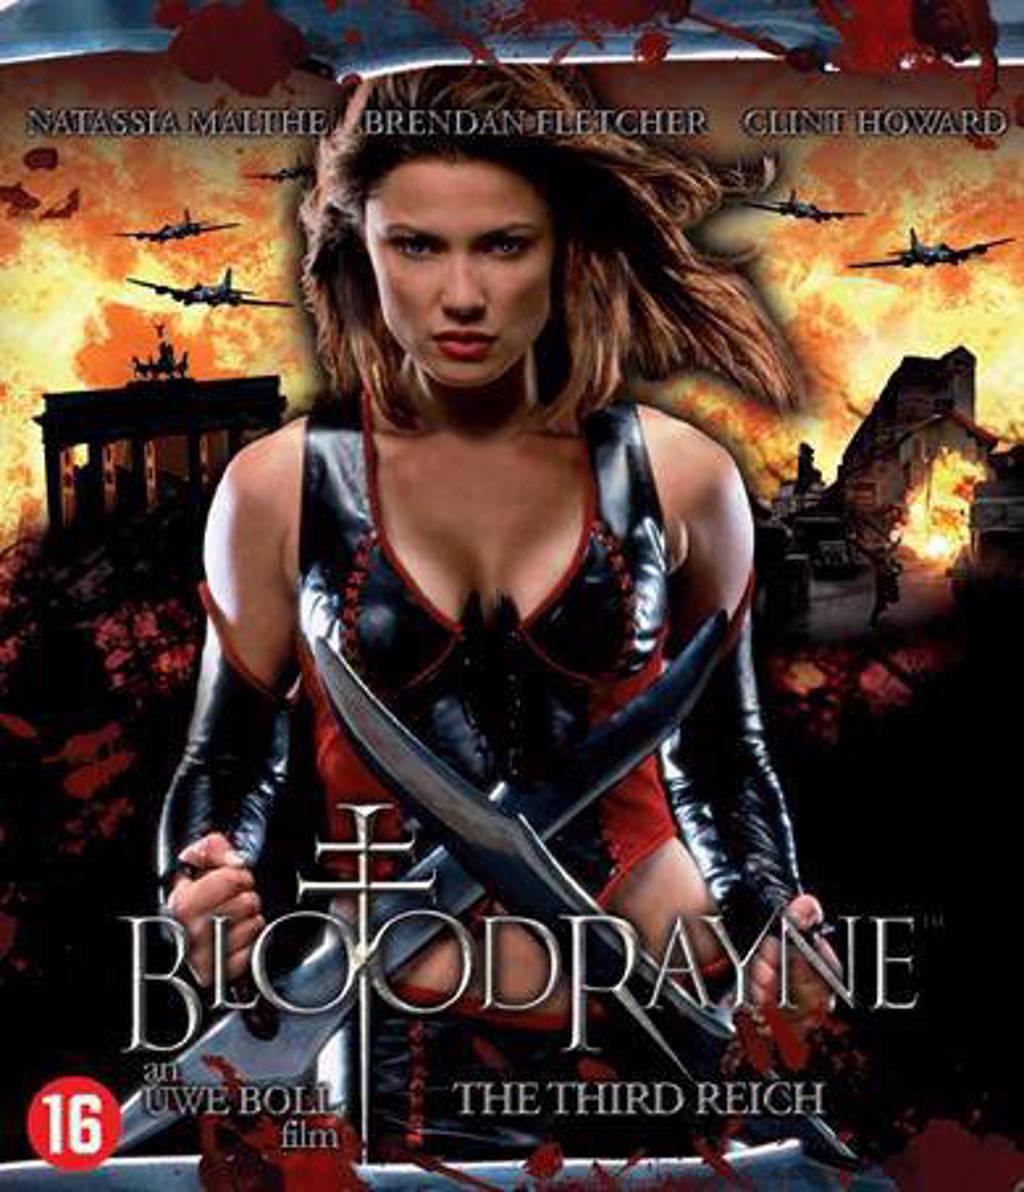 Bloodrayne 3 (Blu-ray)